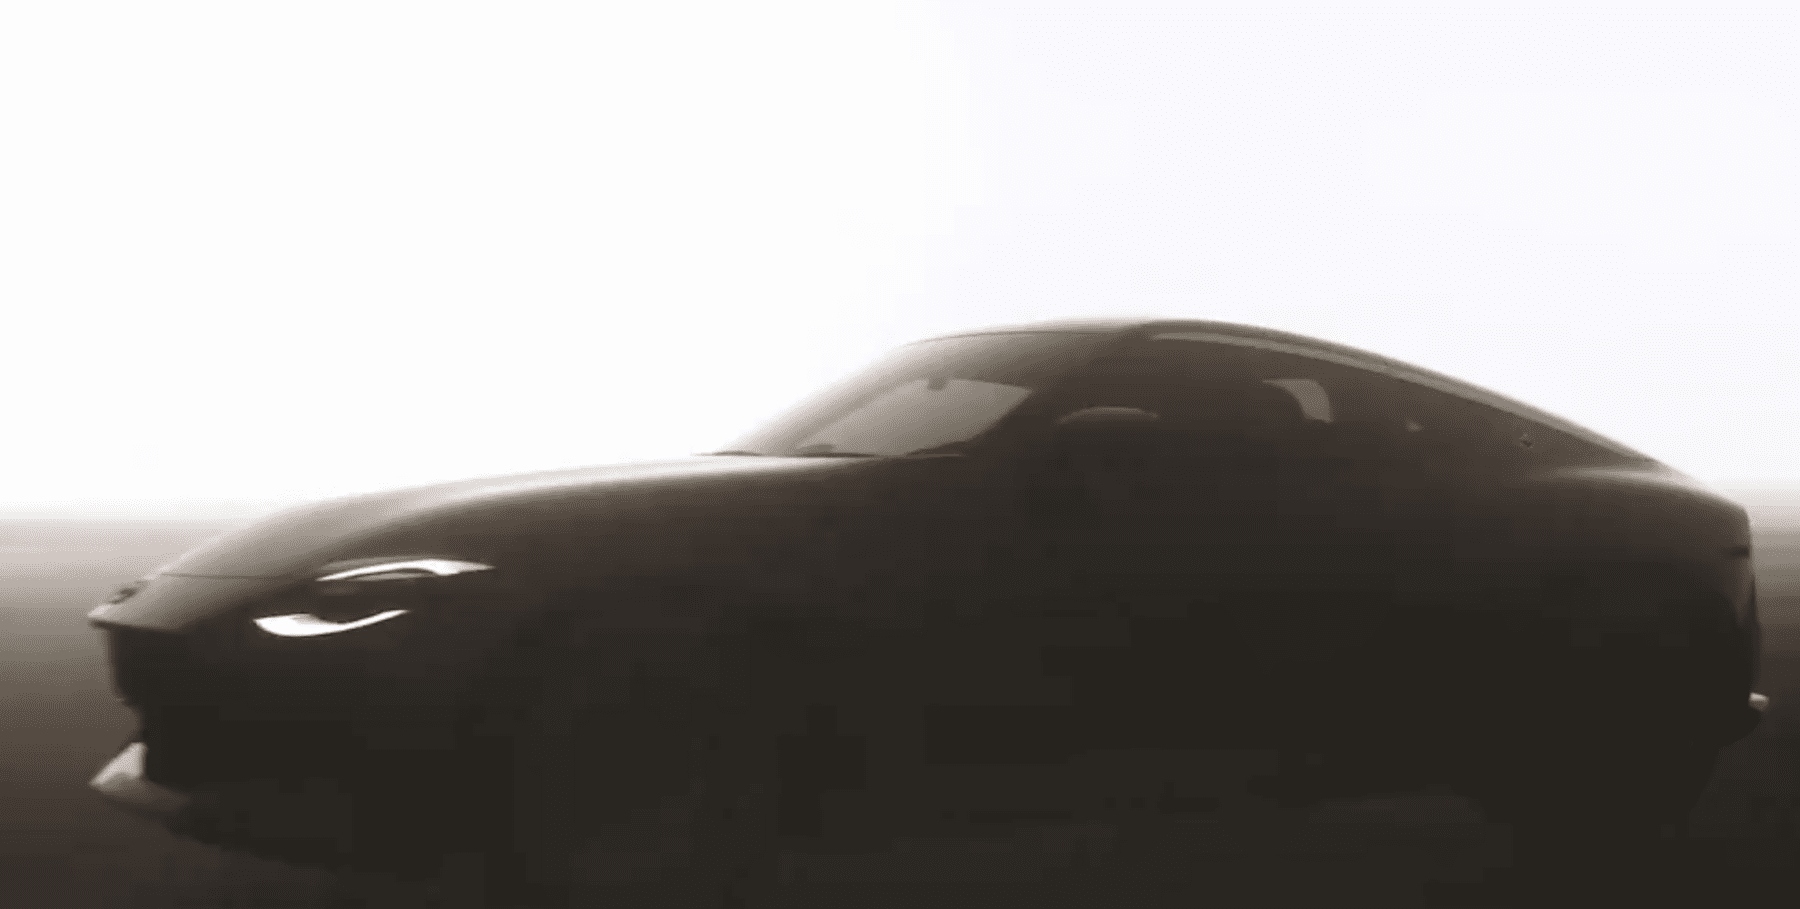 Teaser of the next Nissan Z